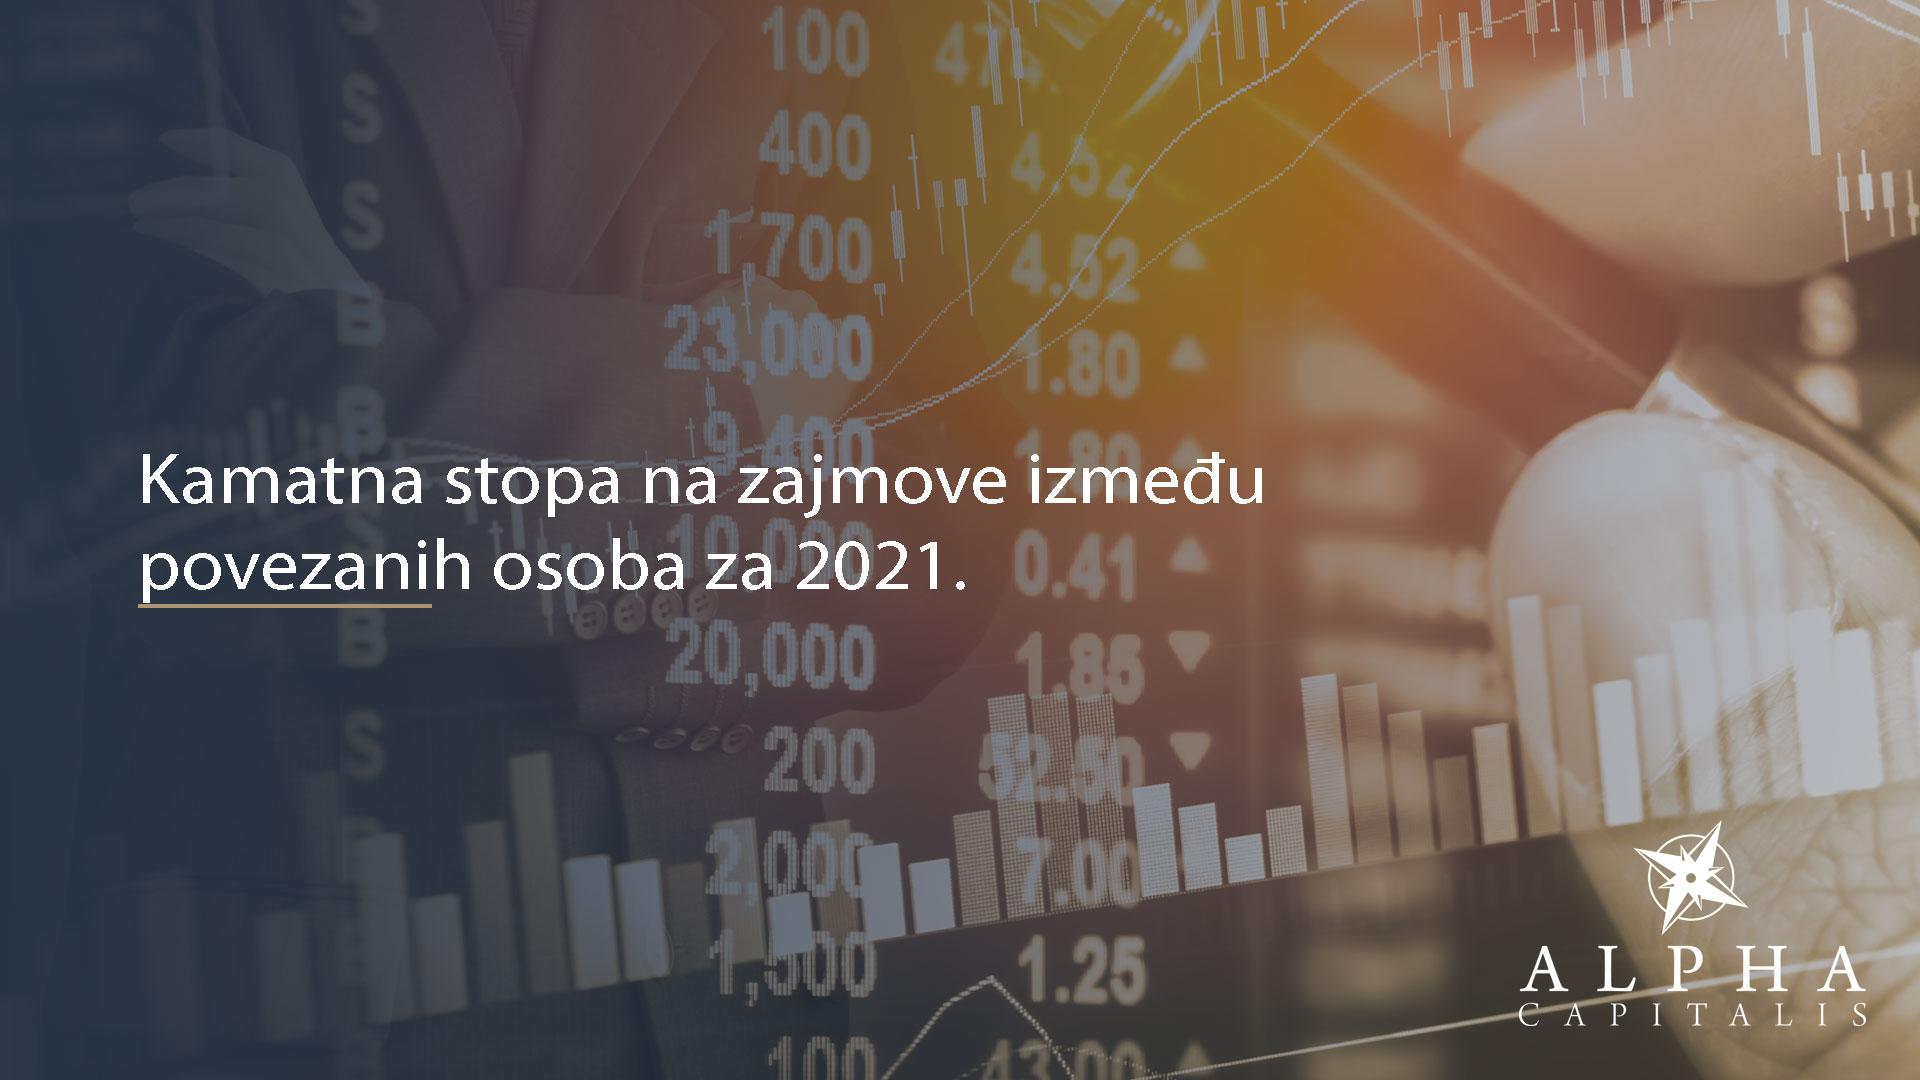 Kamatna stopa na zajmove između povezanih osoba za 2021.